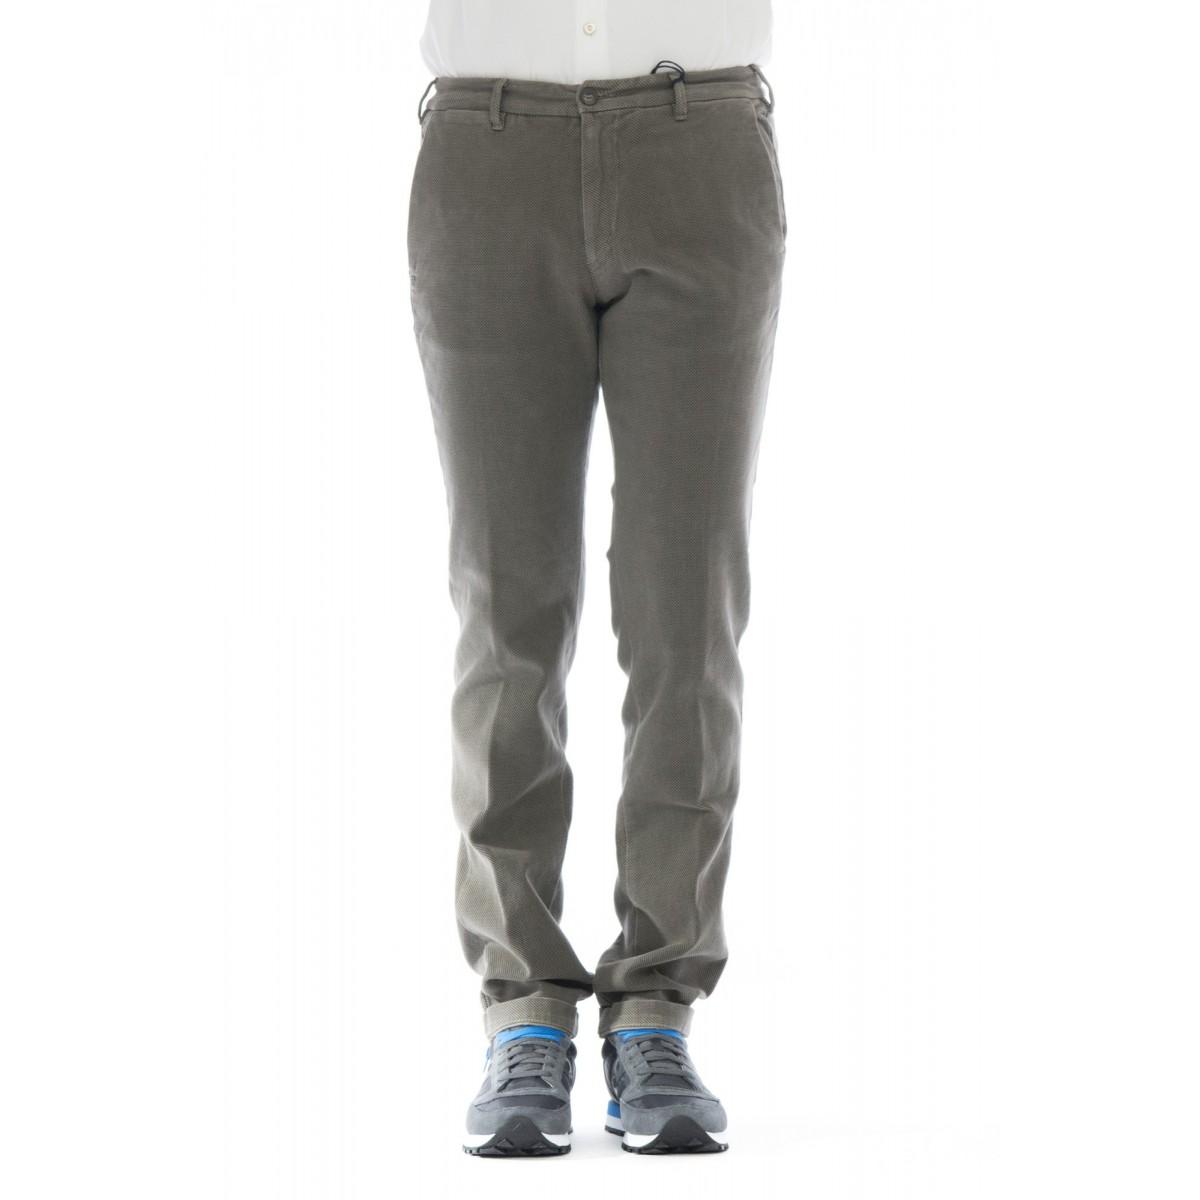 Pantaloni - Lenny 8438 microfantasia